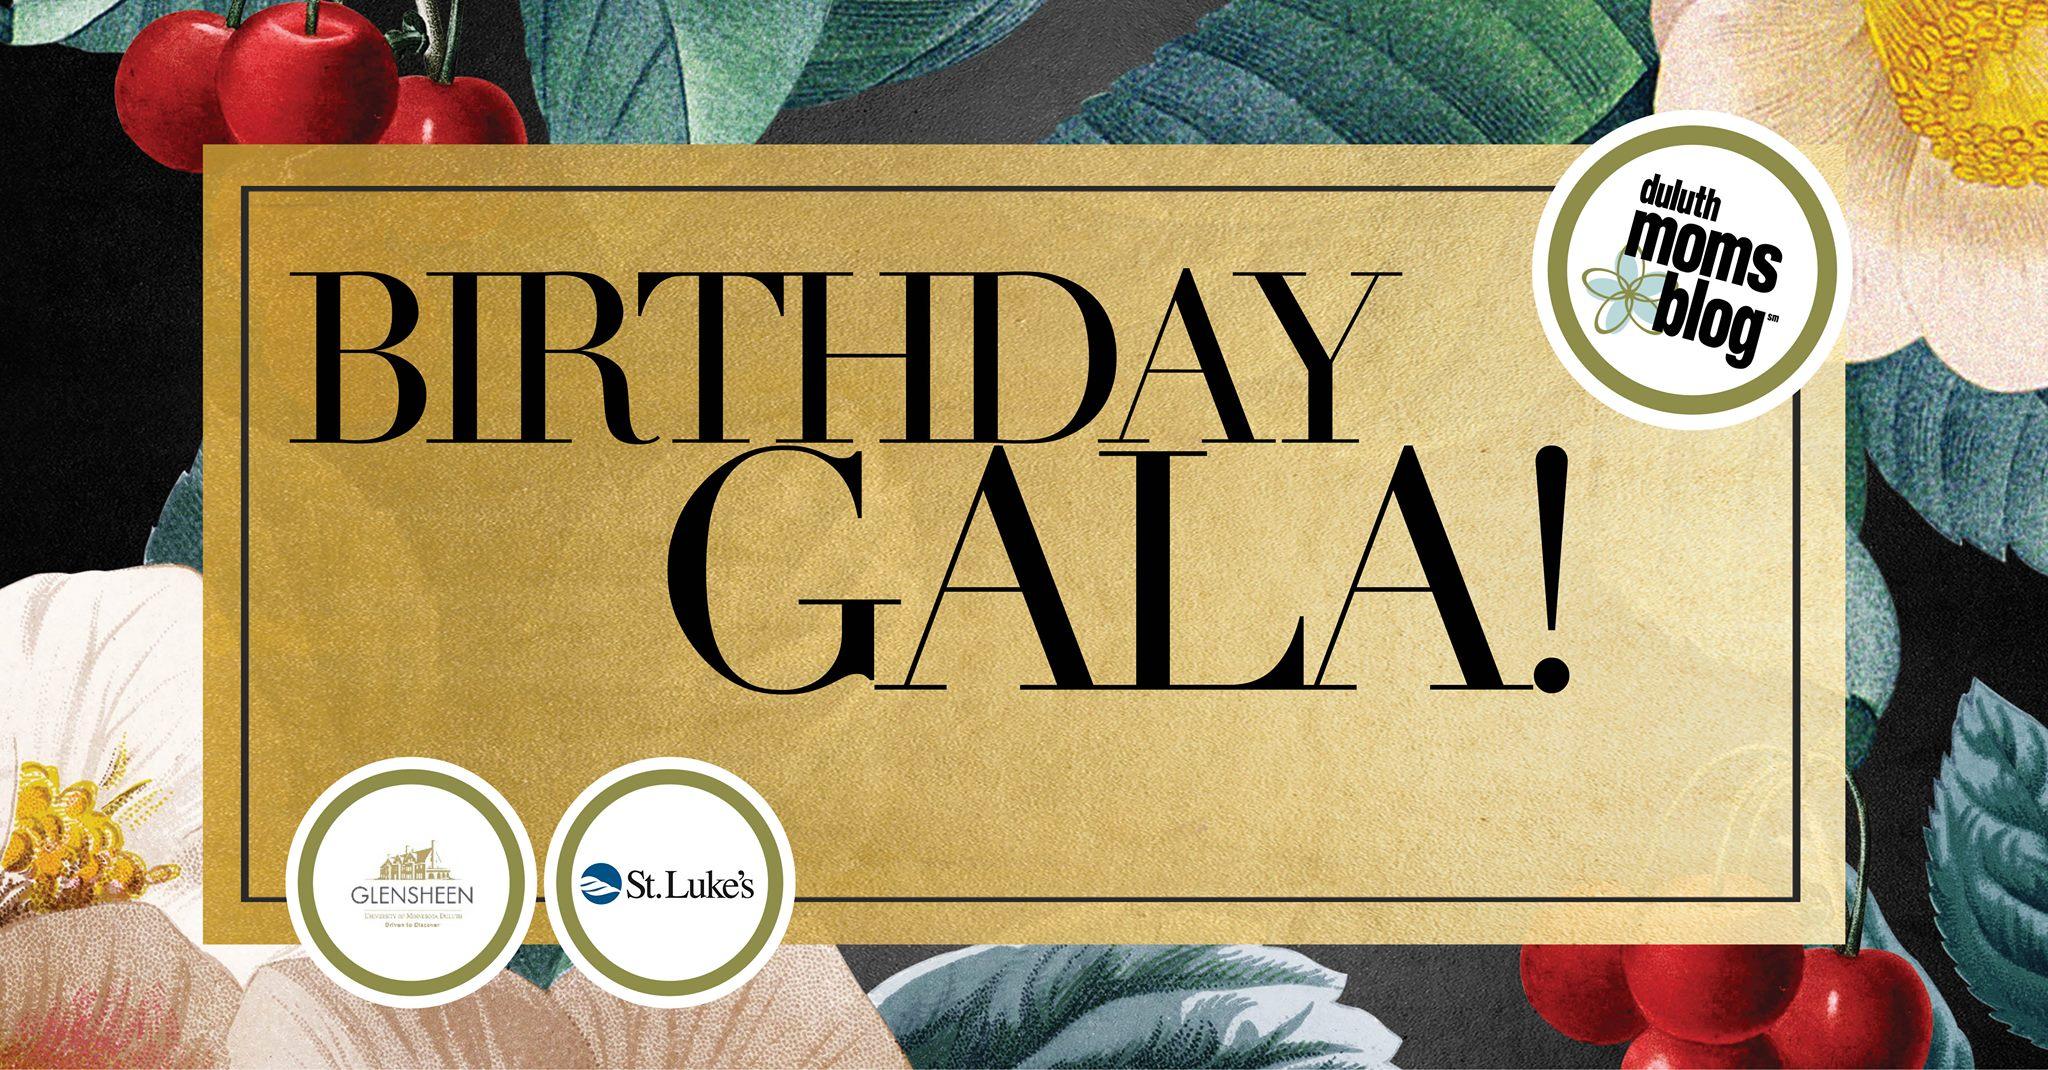 Duluth Mom's Blog First Annual Birthday Gala - Glensheen